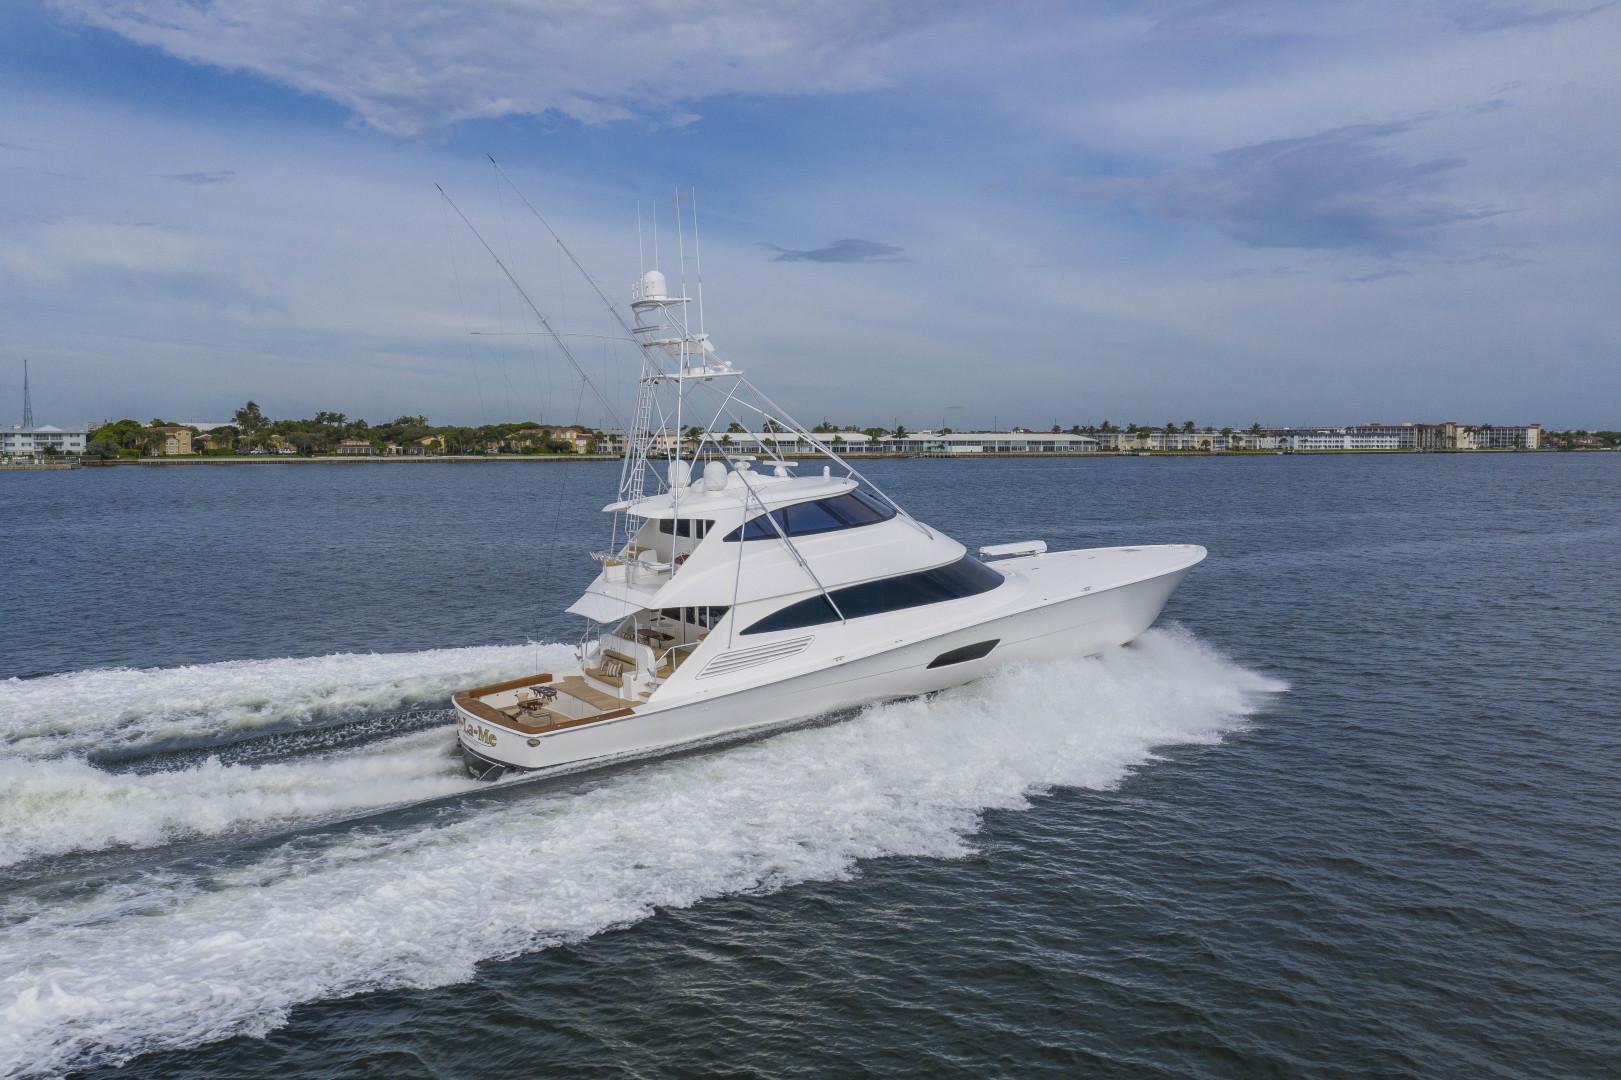 Viking-Enclosed Bridge Sportfish 2016-Fa La Me Palm Beach-Florida-United States-Profile-1487812 | Thumbnail